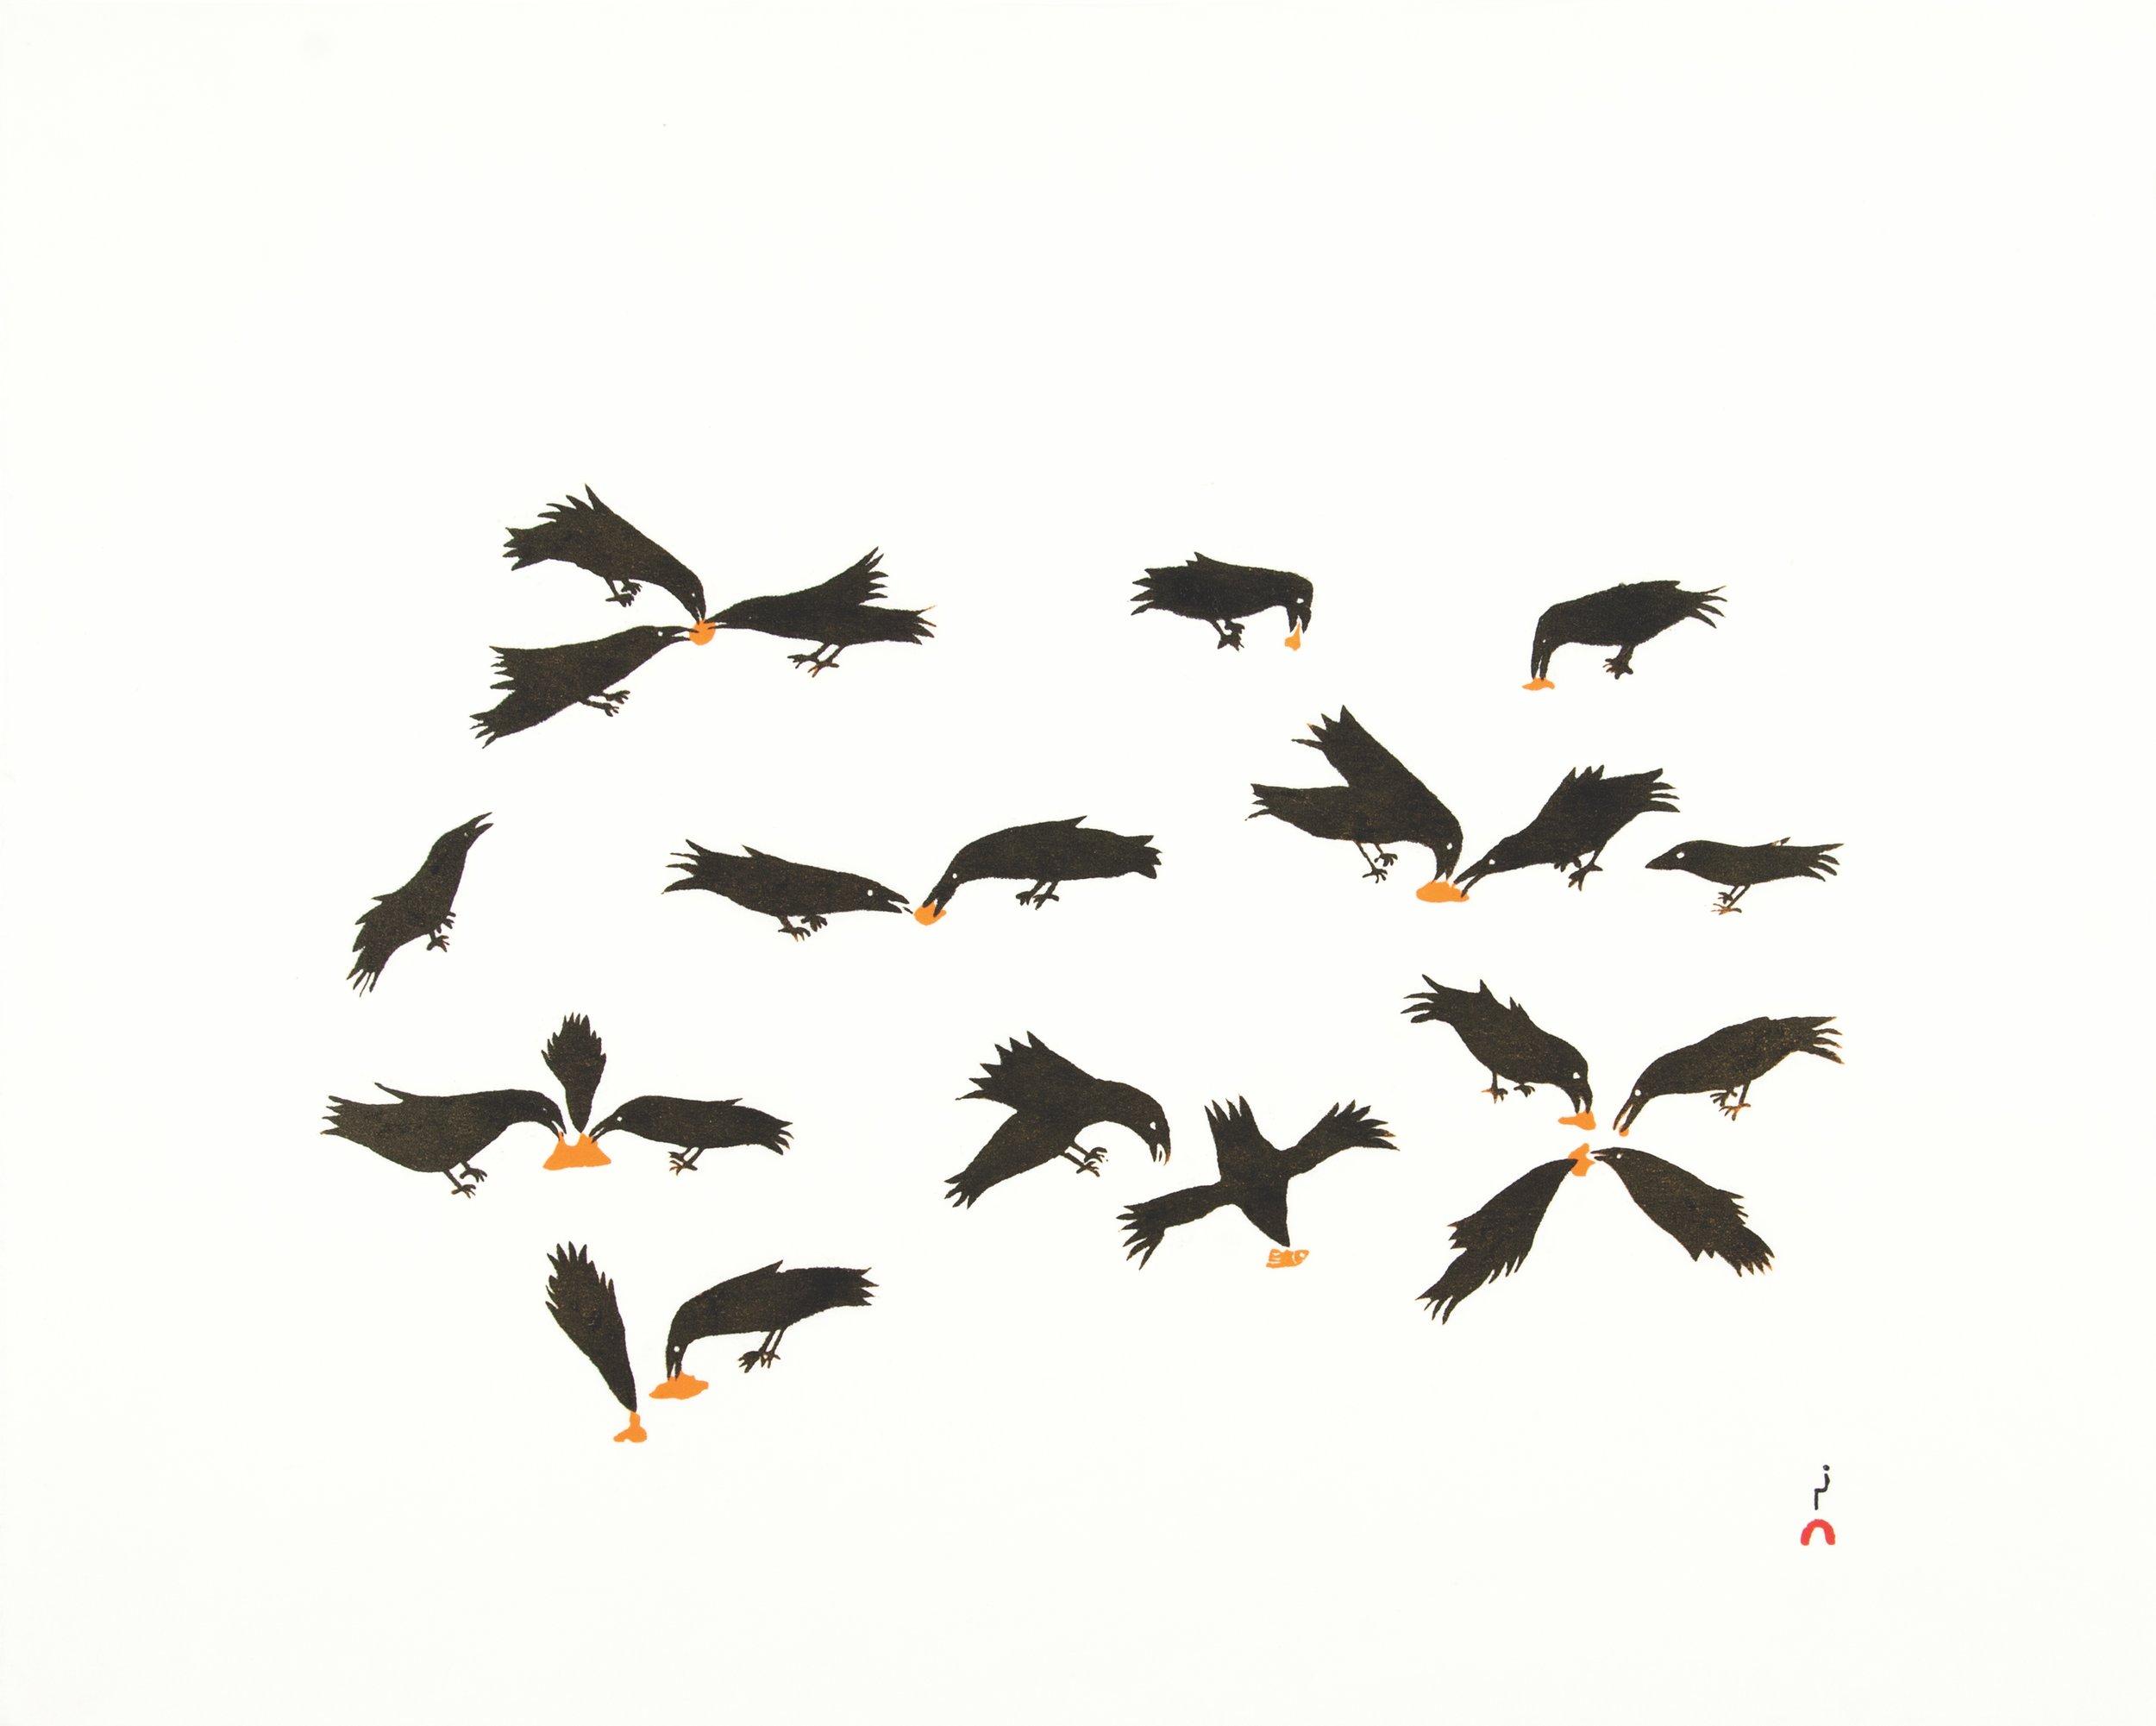 OLOOREAK ETUNGAT Feeding Ravens Stonecut